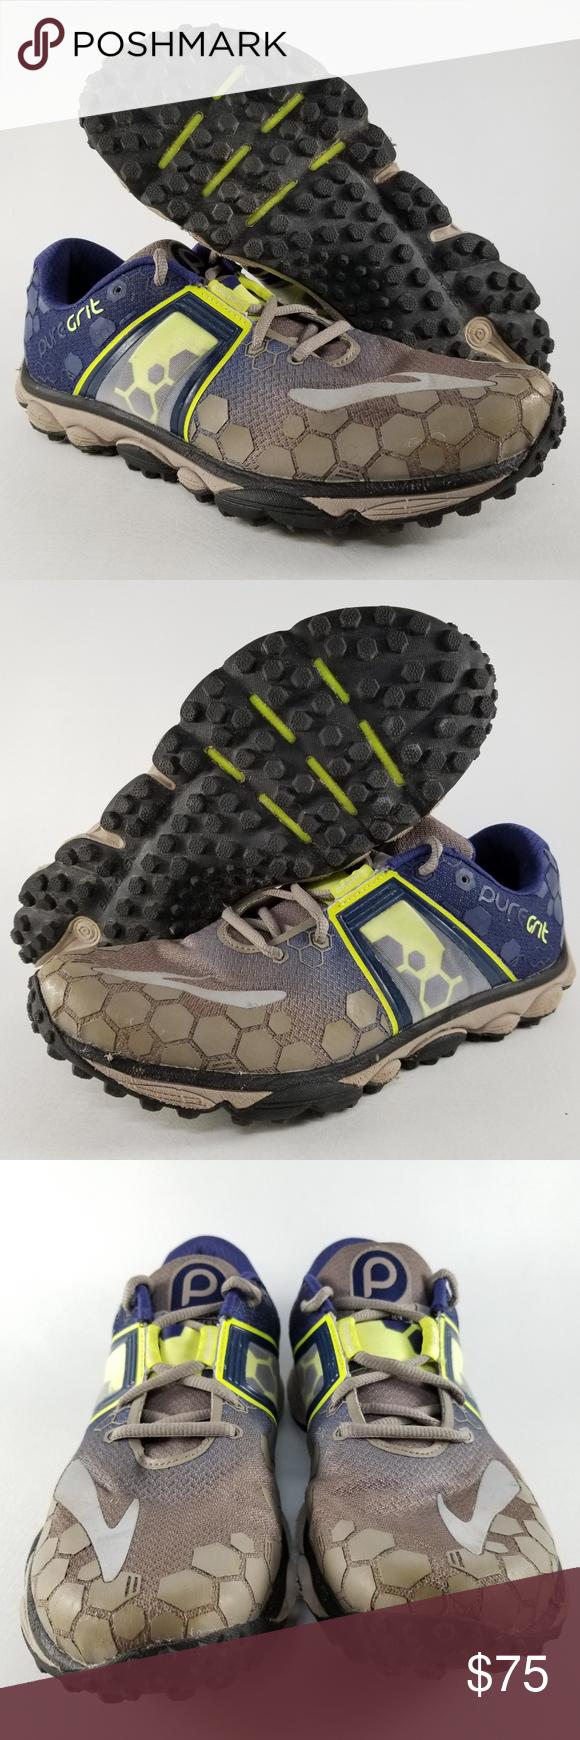 a622ae6bdab Brooks PureGrit 4 Men s Trail Running Shoes SZ 10 Brooks PureGrit 4 Men s  Trail Running Athletic